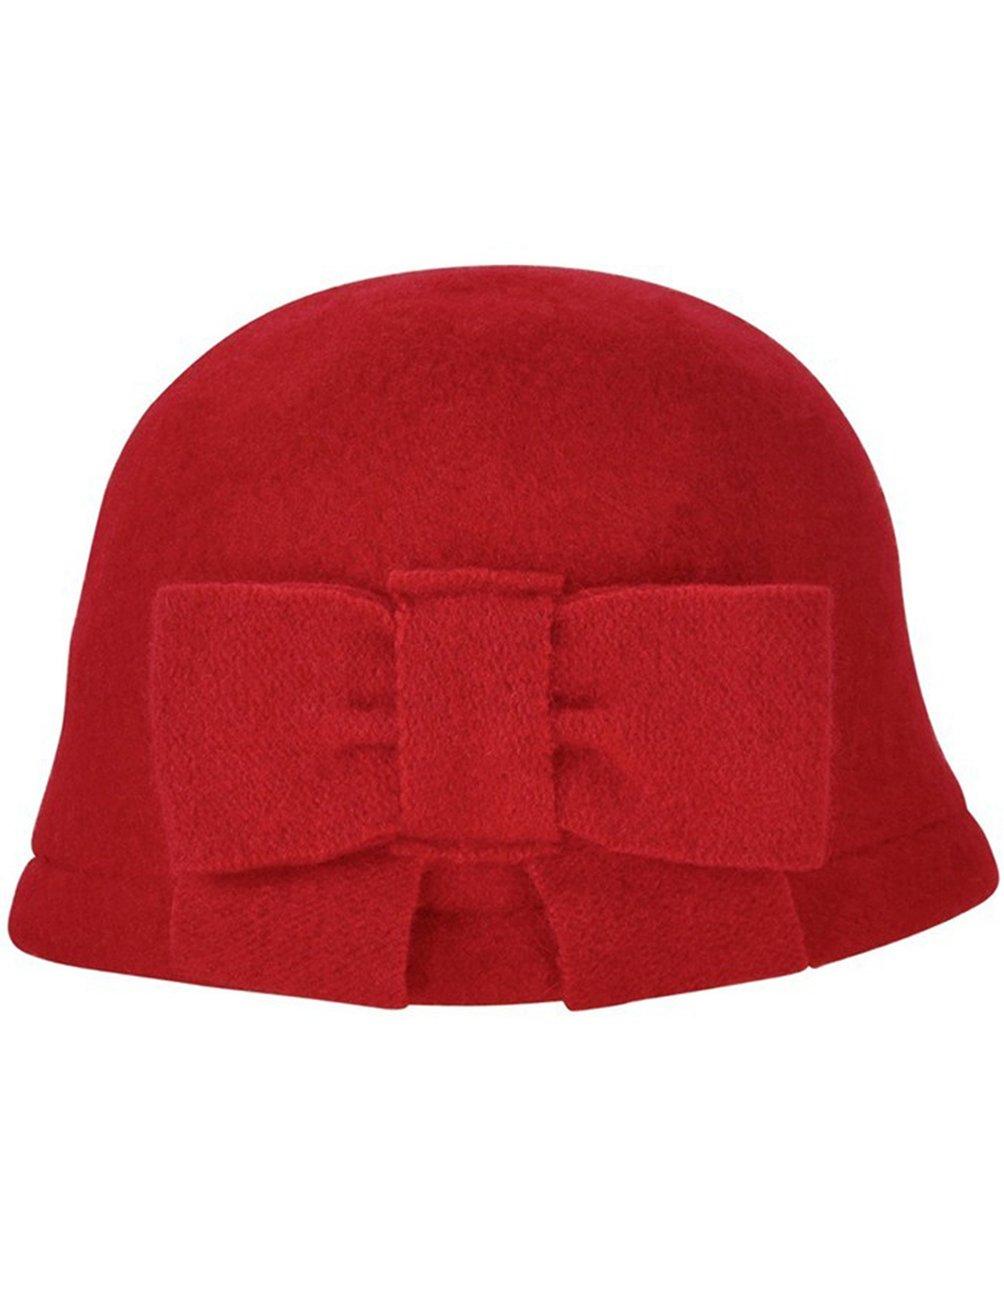 Dahlia Women's Vintage Large Bow Wool Cloche Bucket Hat - Red